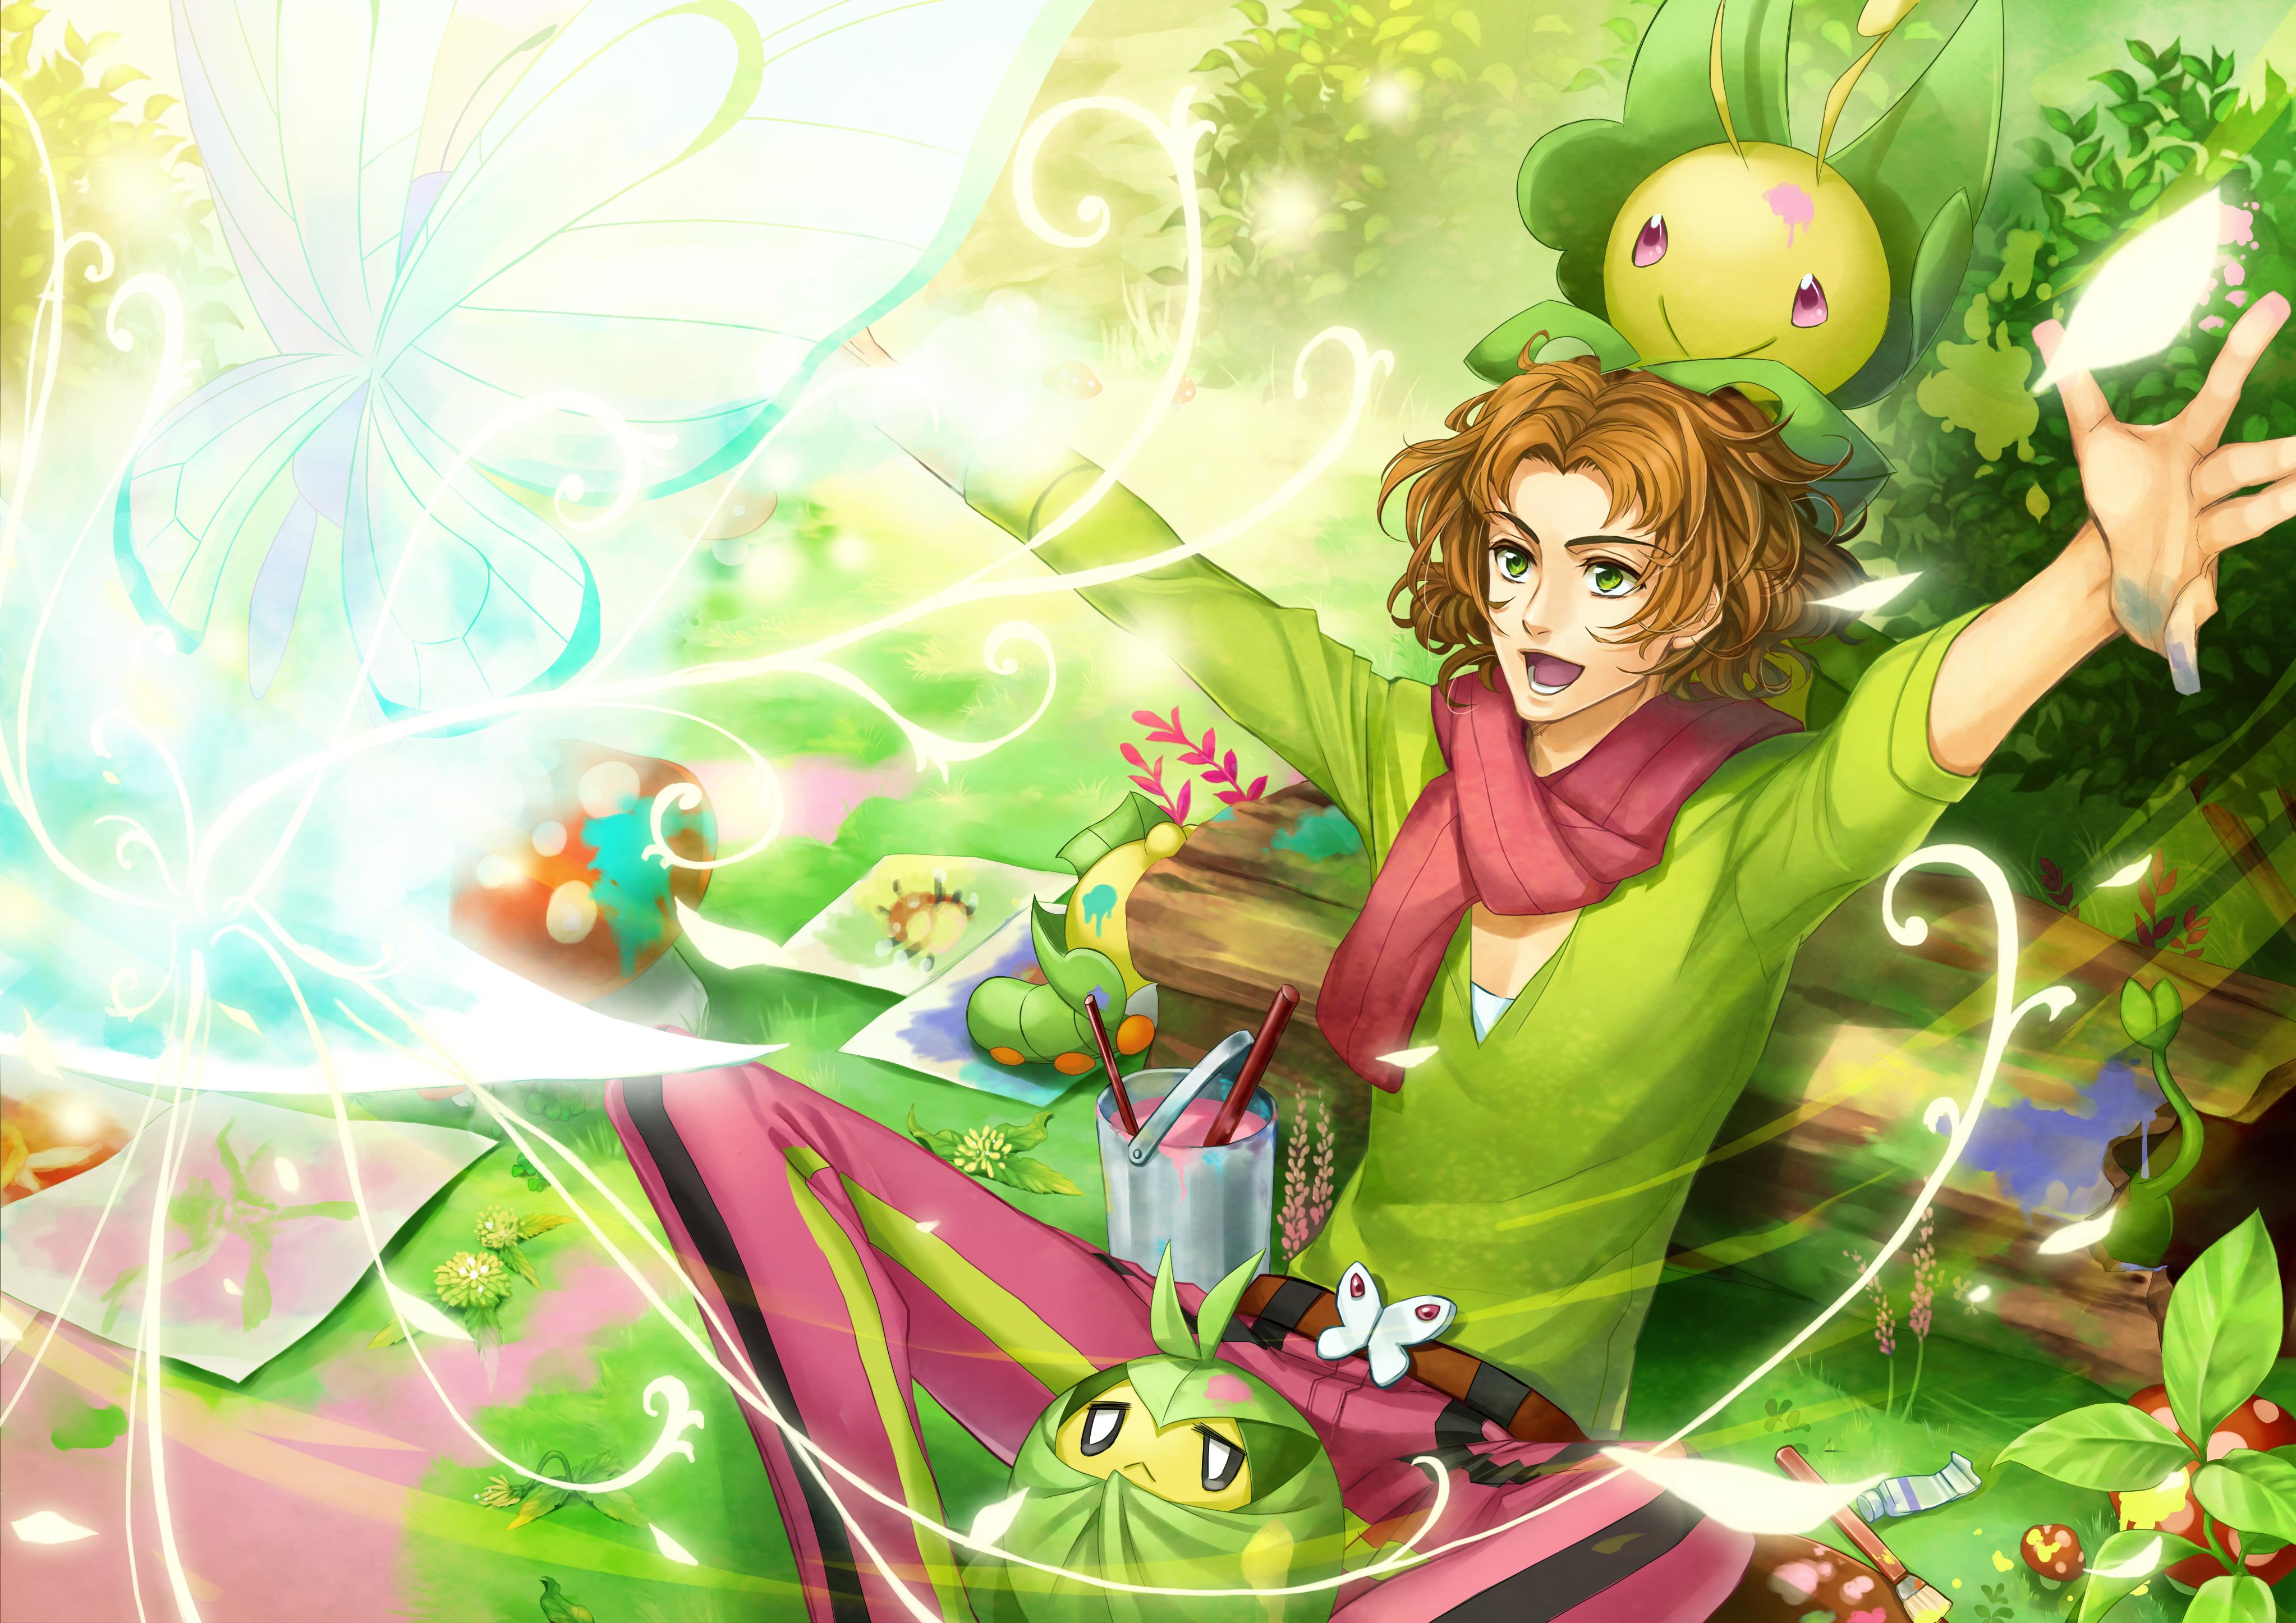 arty pokémon burgh pokemon image 1069066 zerochan anime